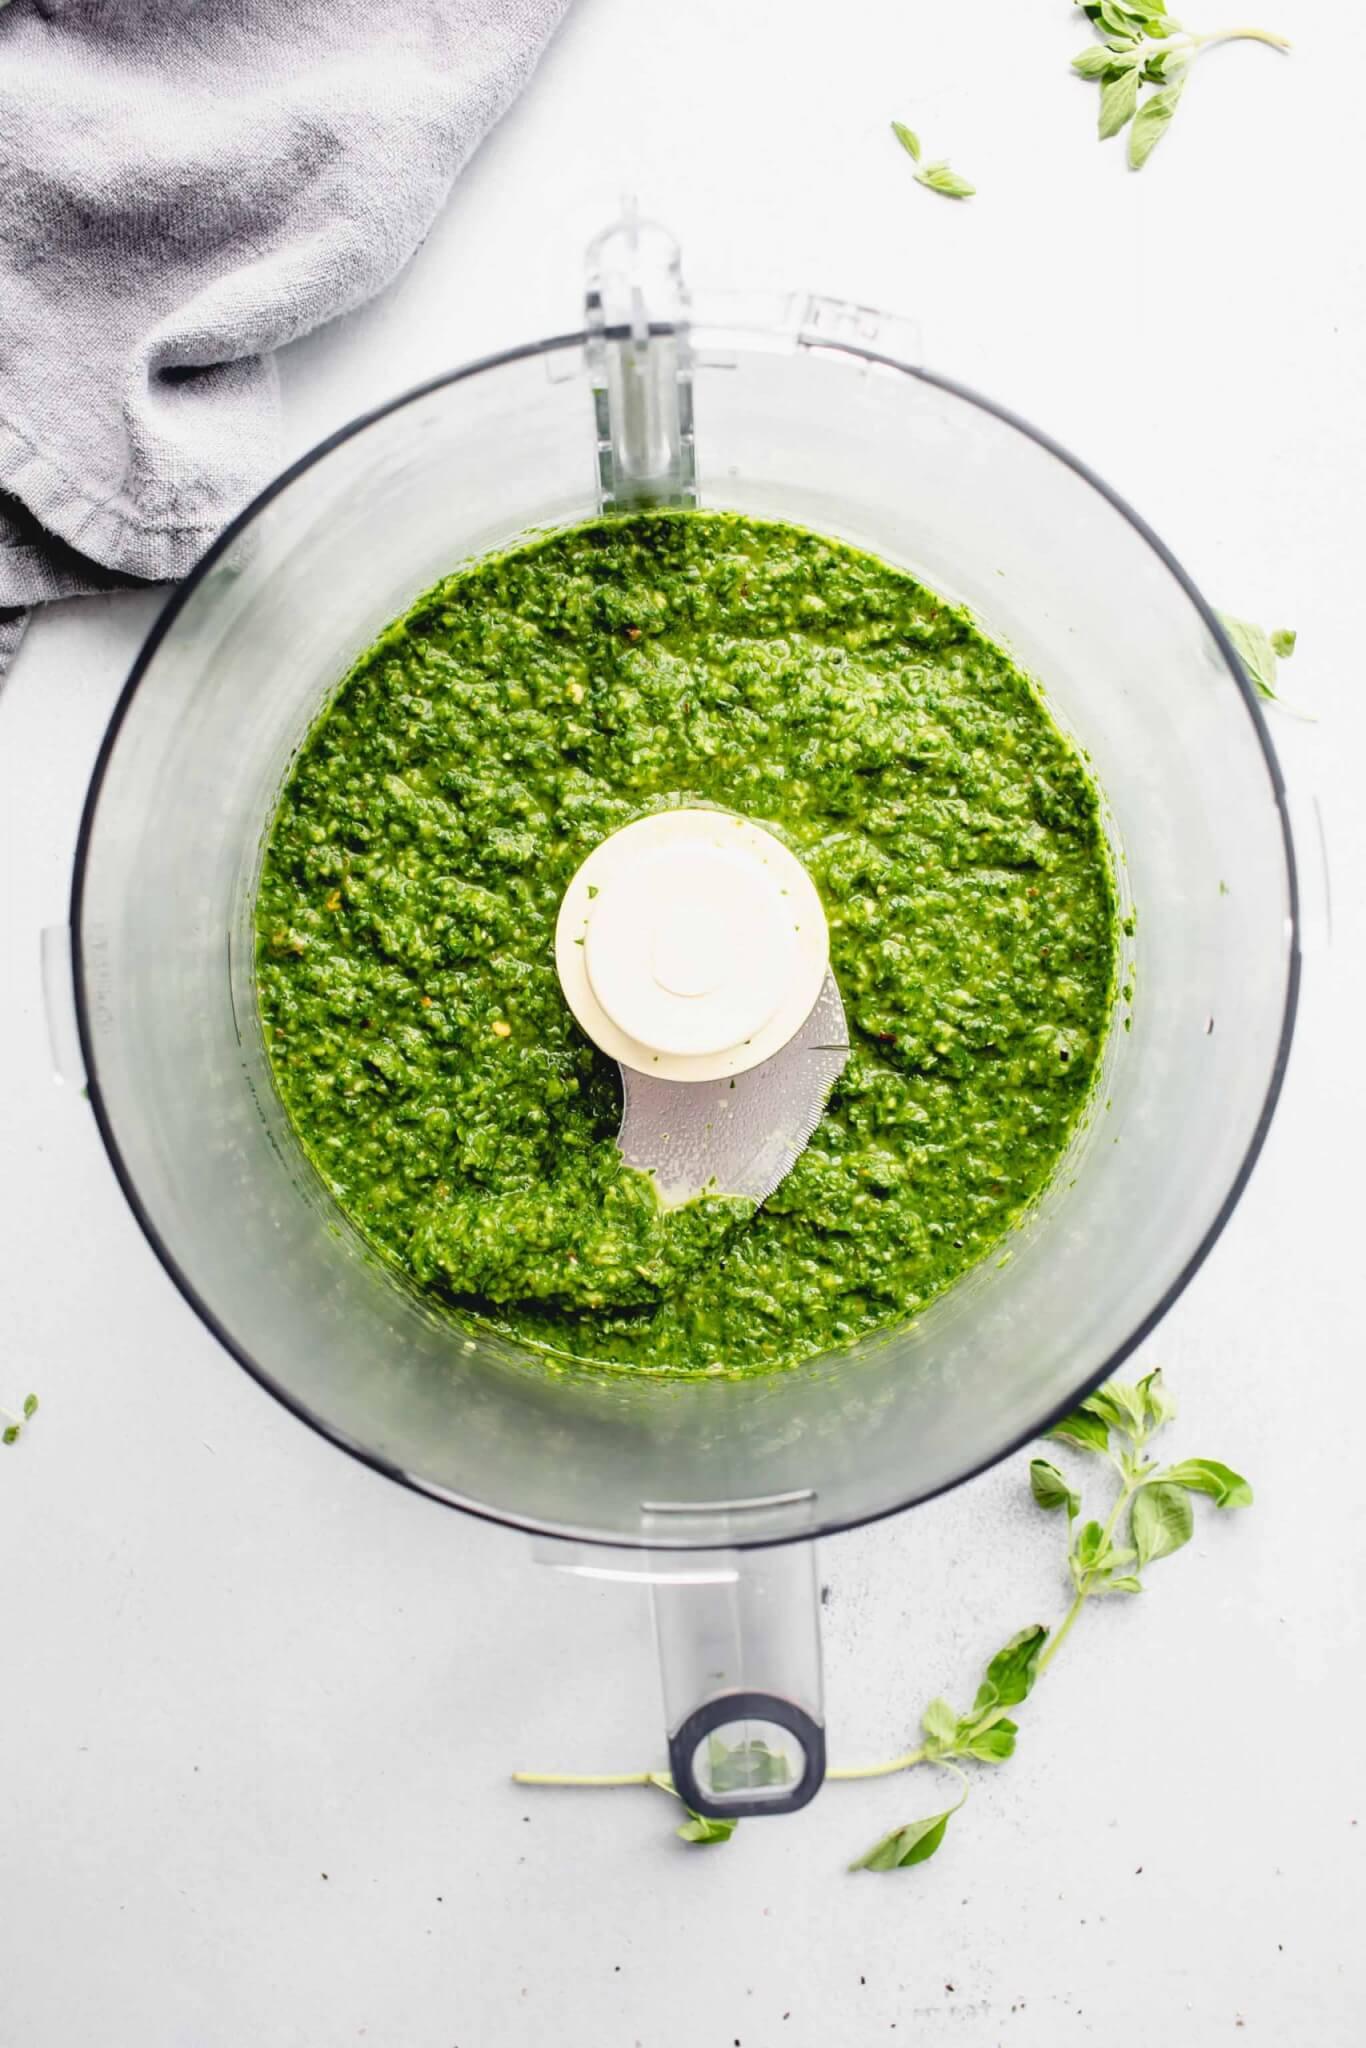 Chimichurri sauce in food processor